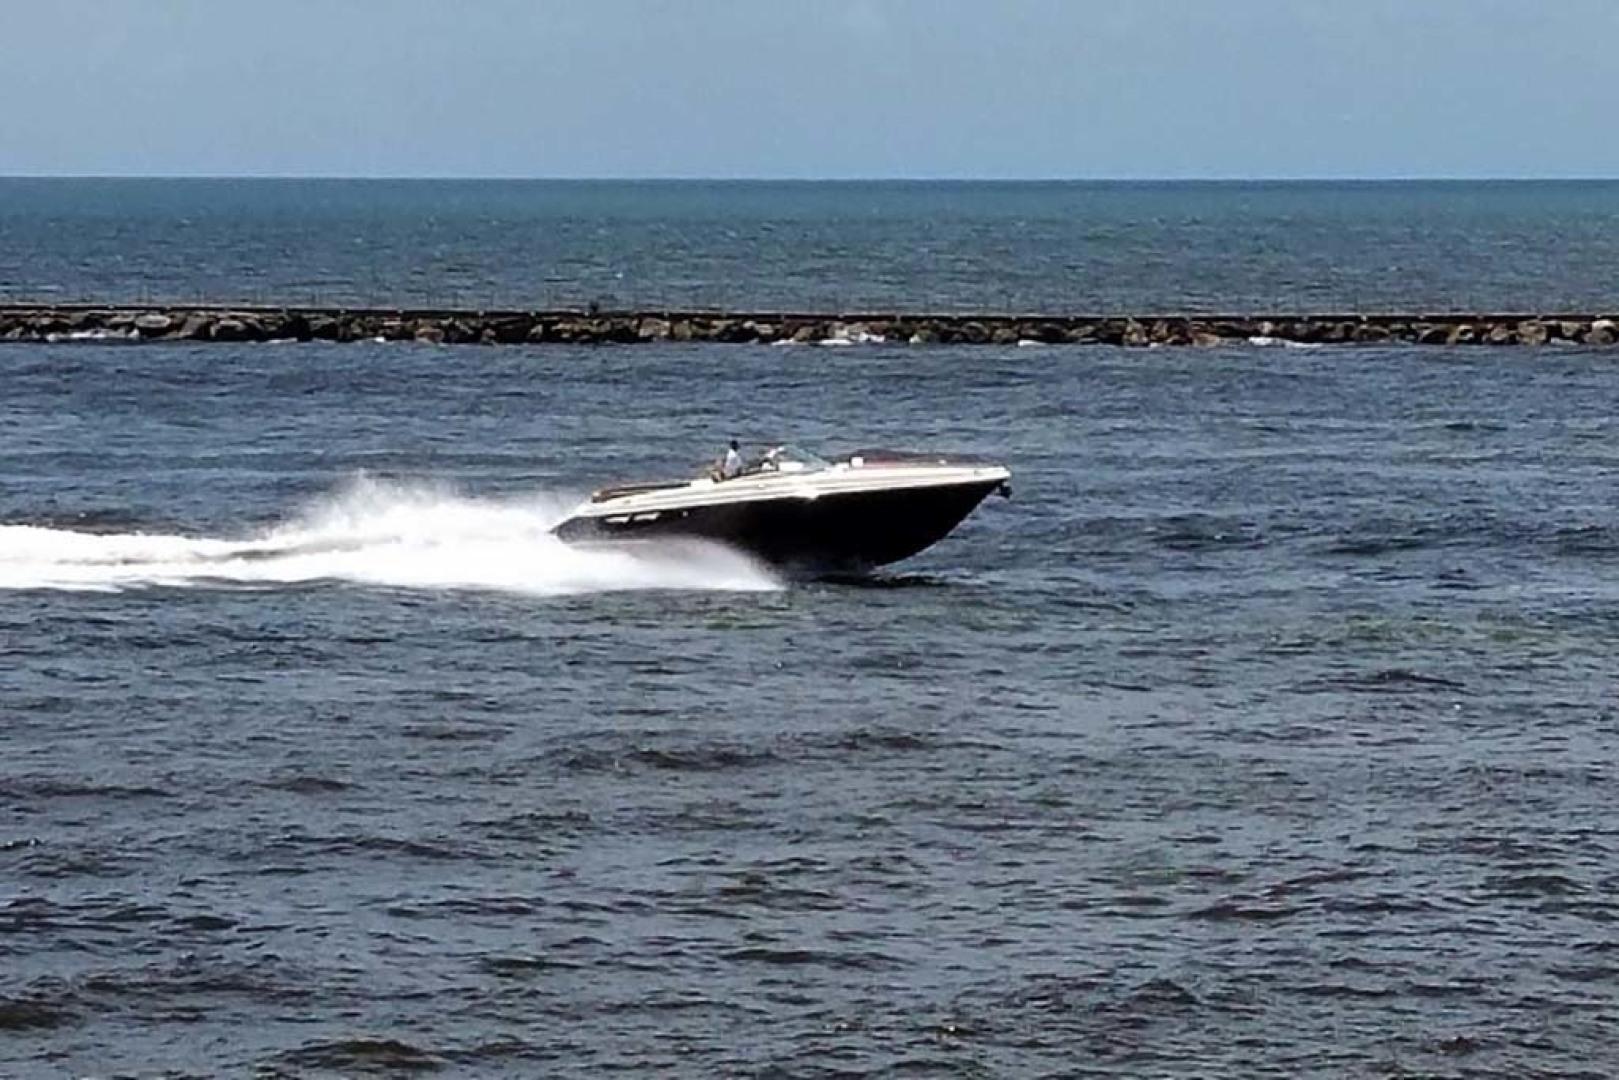 Chris-Craft-Corsair 36 2013-La Dolce Vita Fort Lauderdale-Florida-United States-Running View-1074561 | Thumbnail